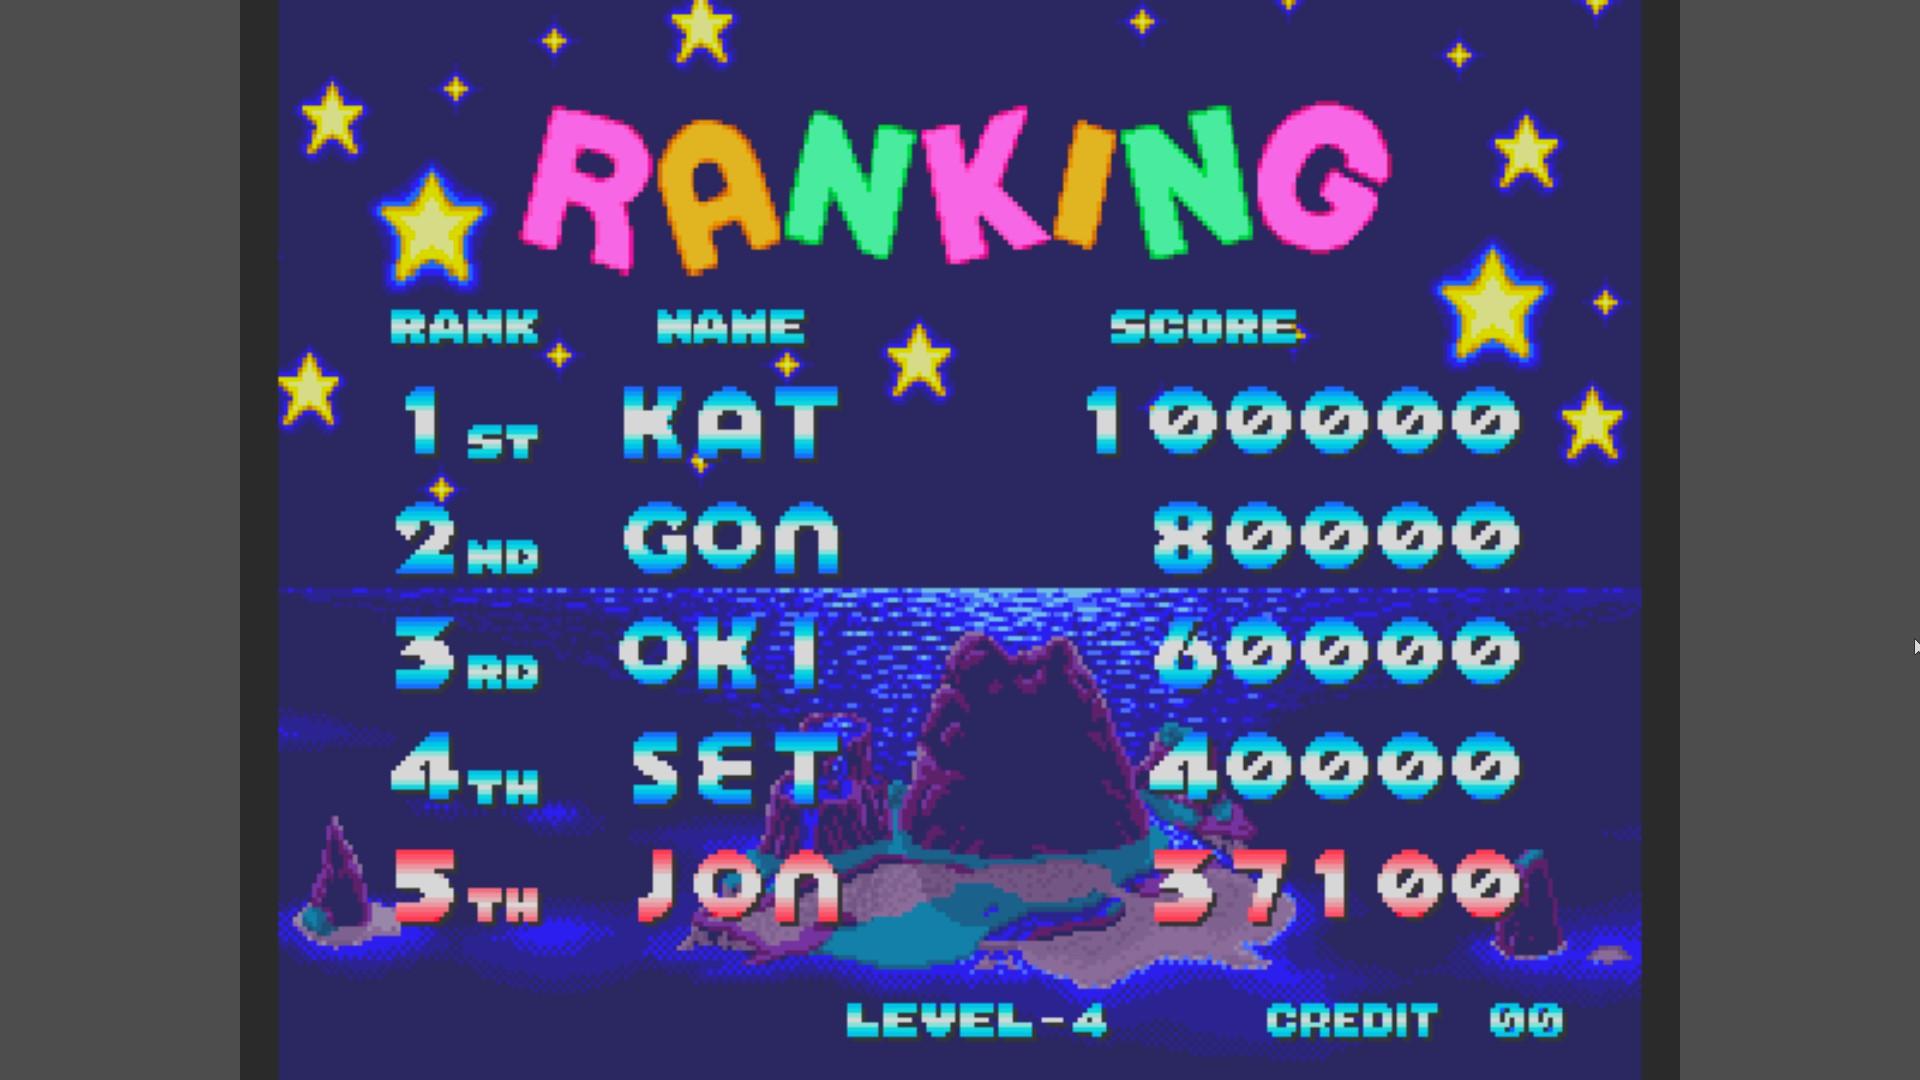 AkinNahtanoj: Zupapa! (Arcade Emulated / M.A.M.E.) 37,100 points on 2020-12-28 00:27:48